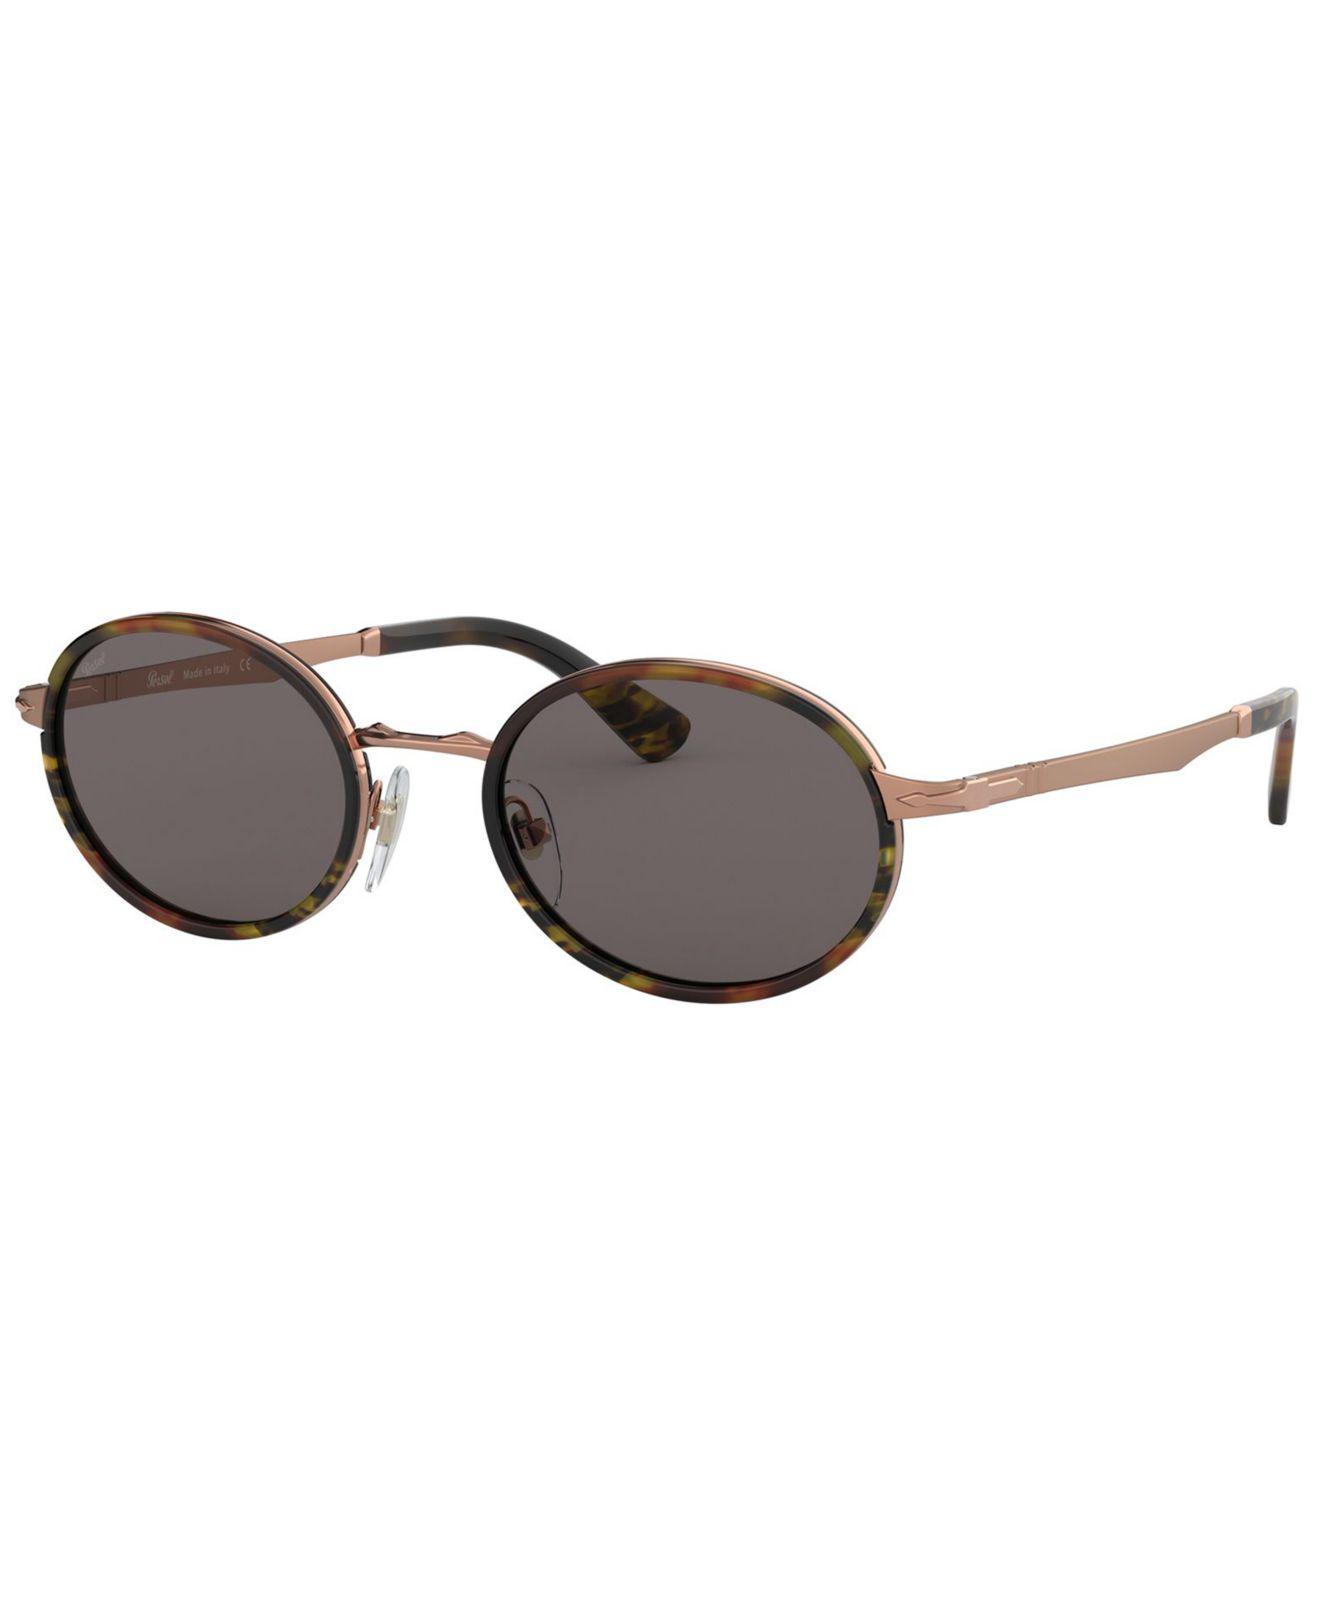 94d3bc2843 Persol. Women s Black Sunglasses ...